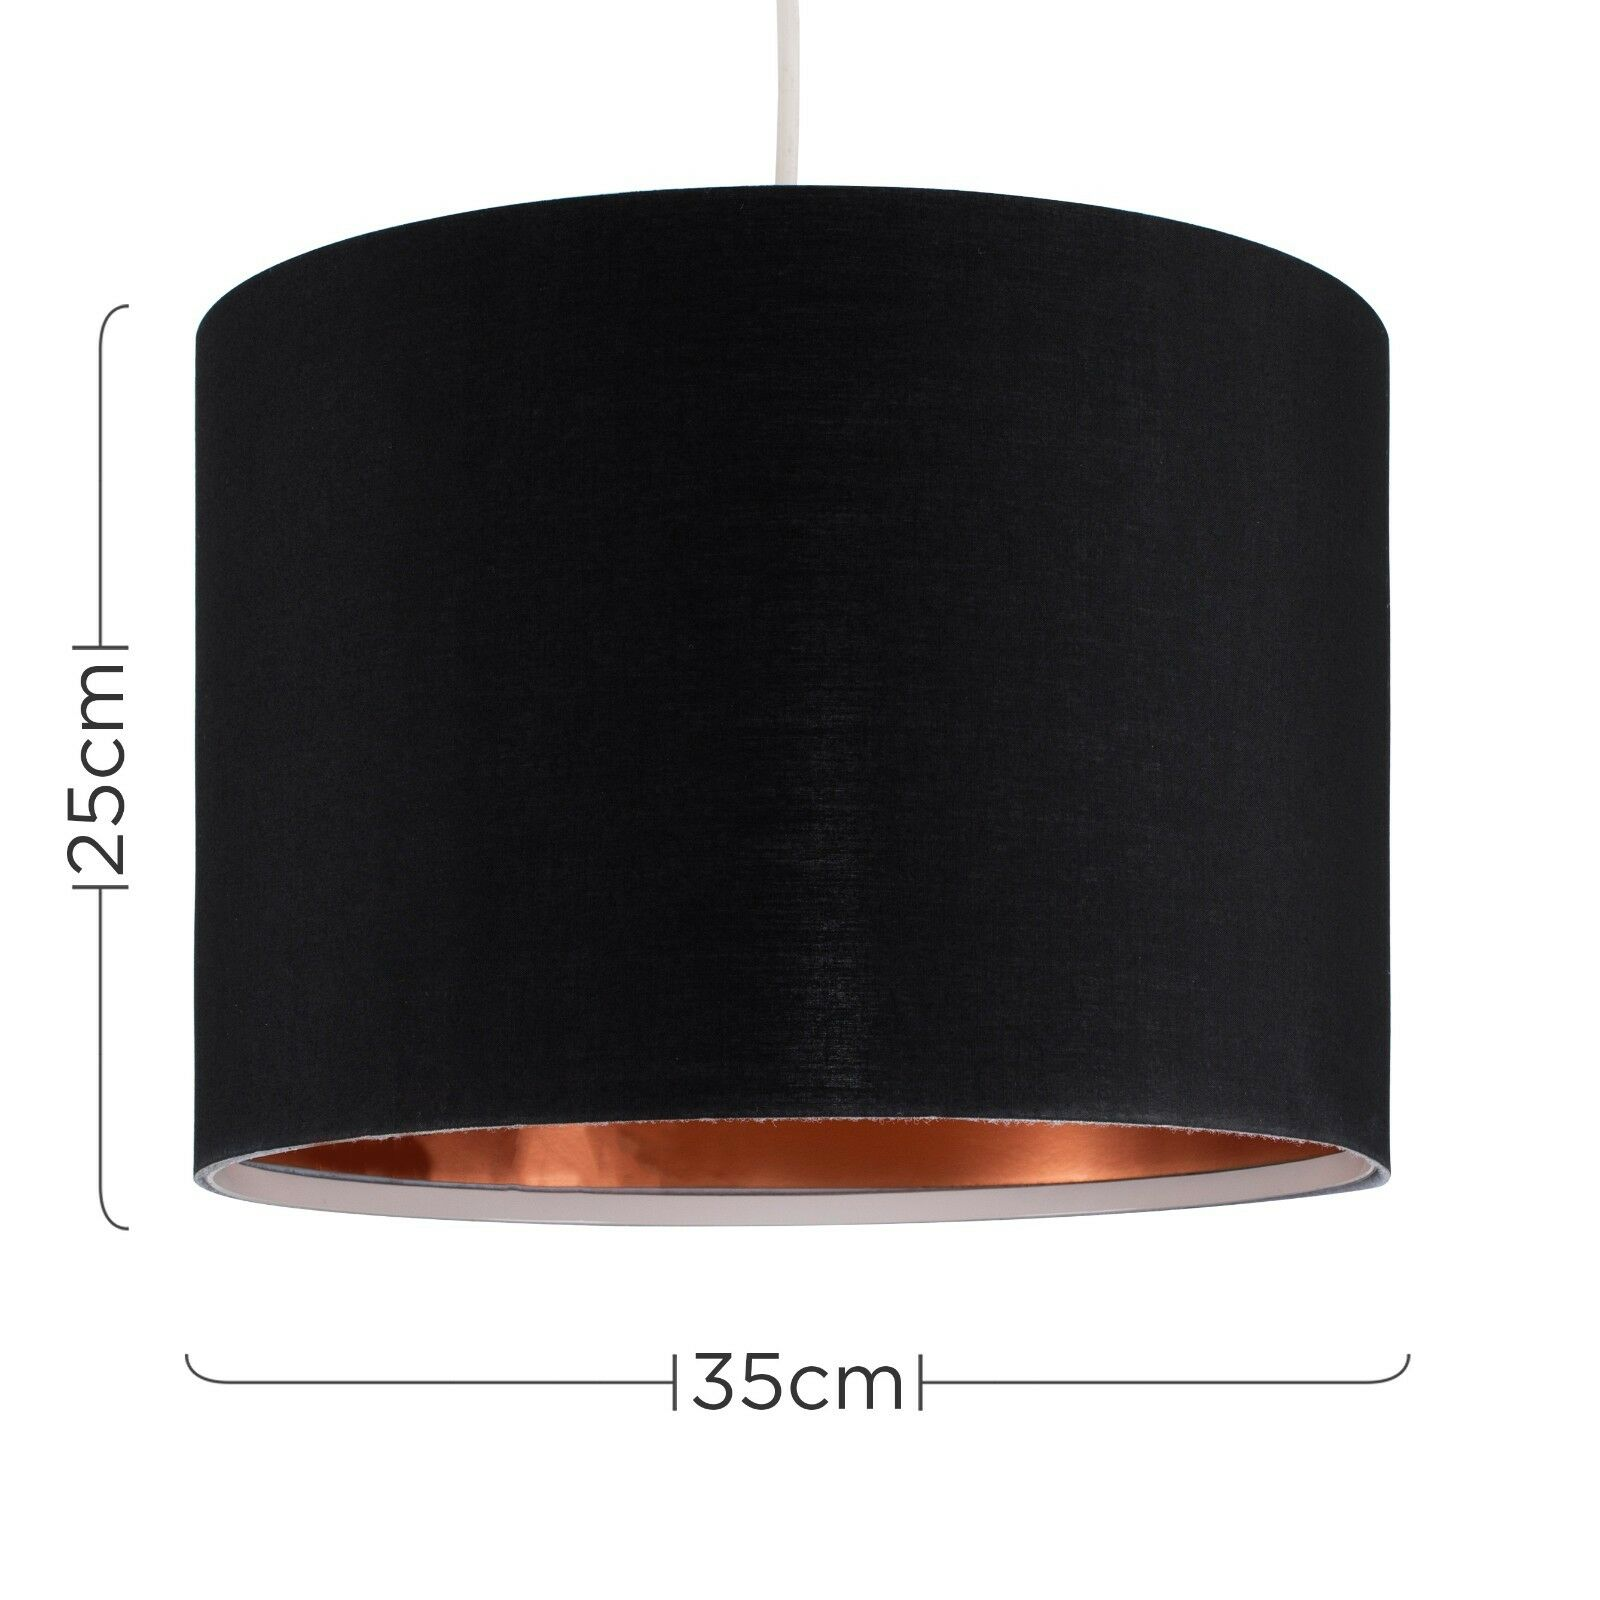 Tela-moderna-algodon-facil-ajuste-Techo-Colgante-Pantalla-De-Mesa-tonos-de-luz-de-tambor miniatura 36